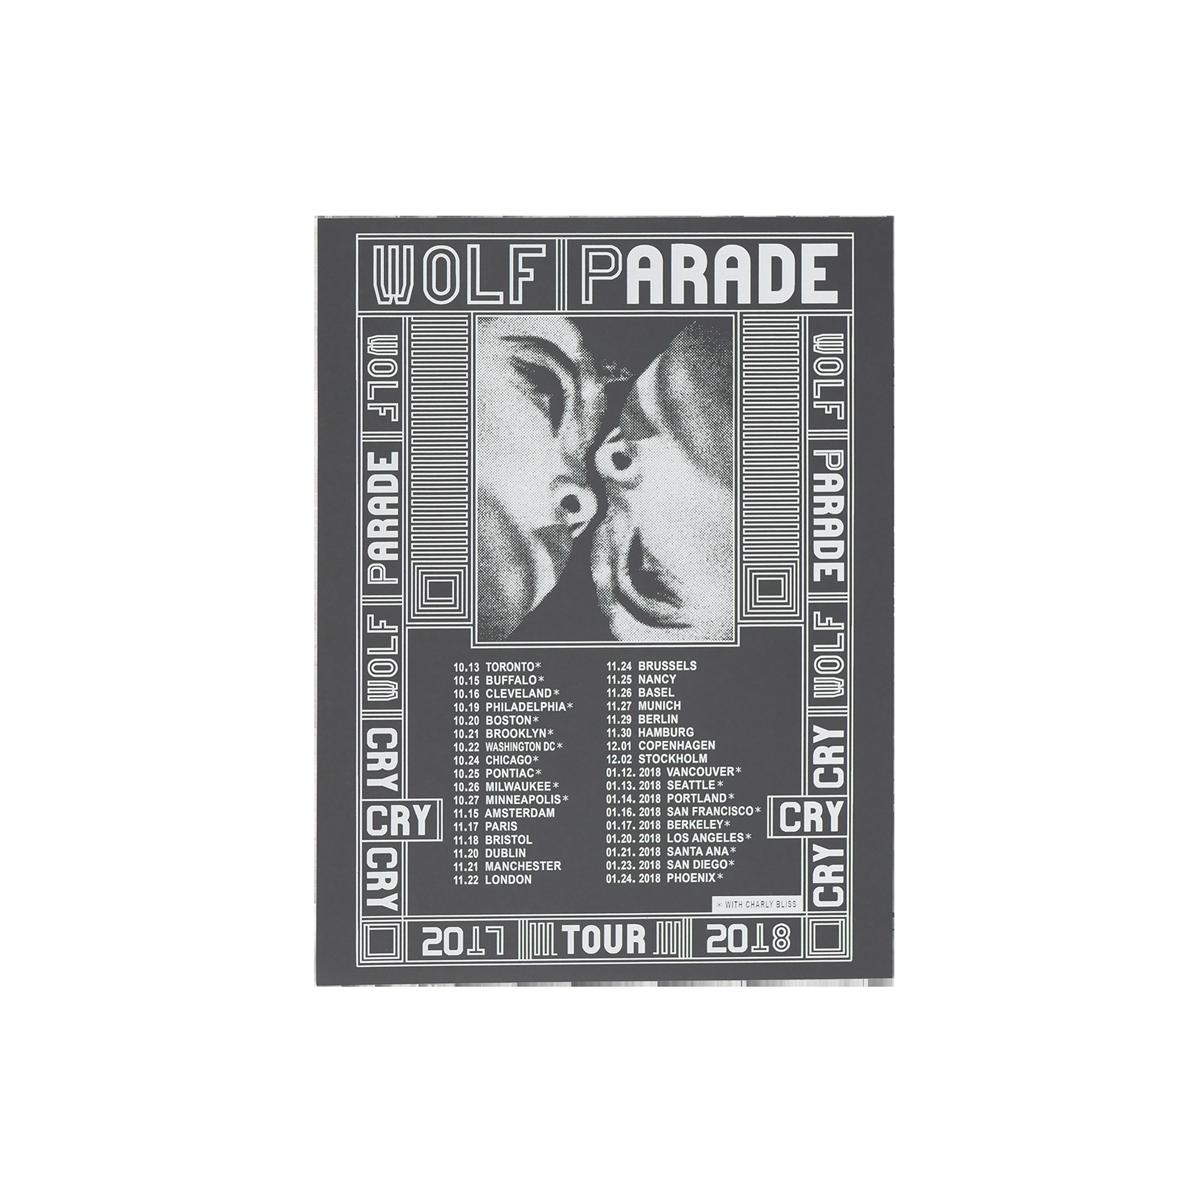 2017/2018 Tour Poster